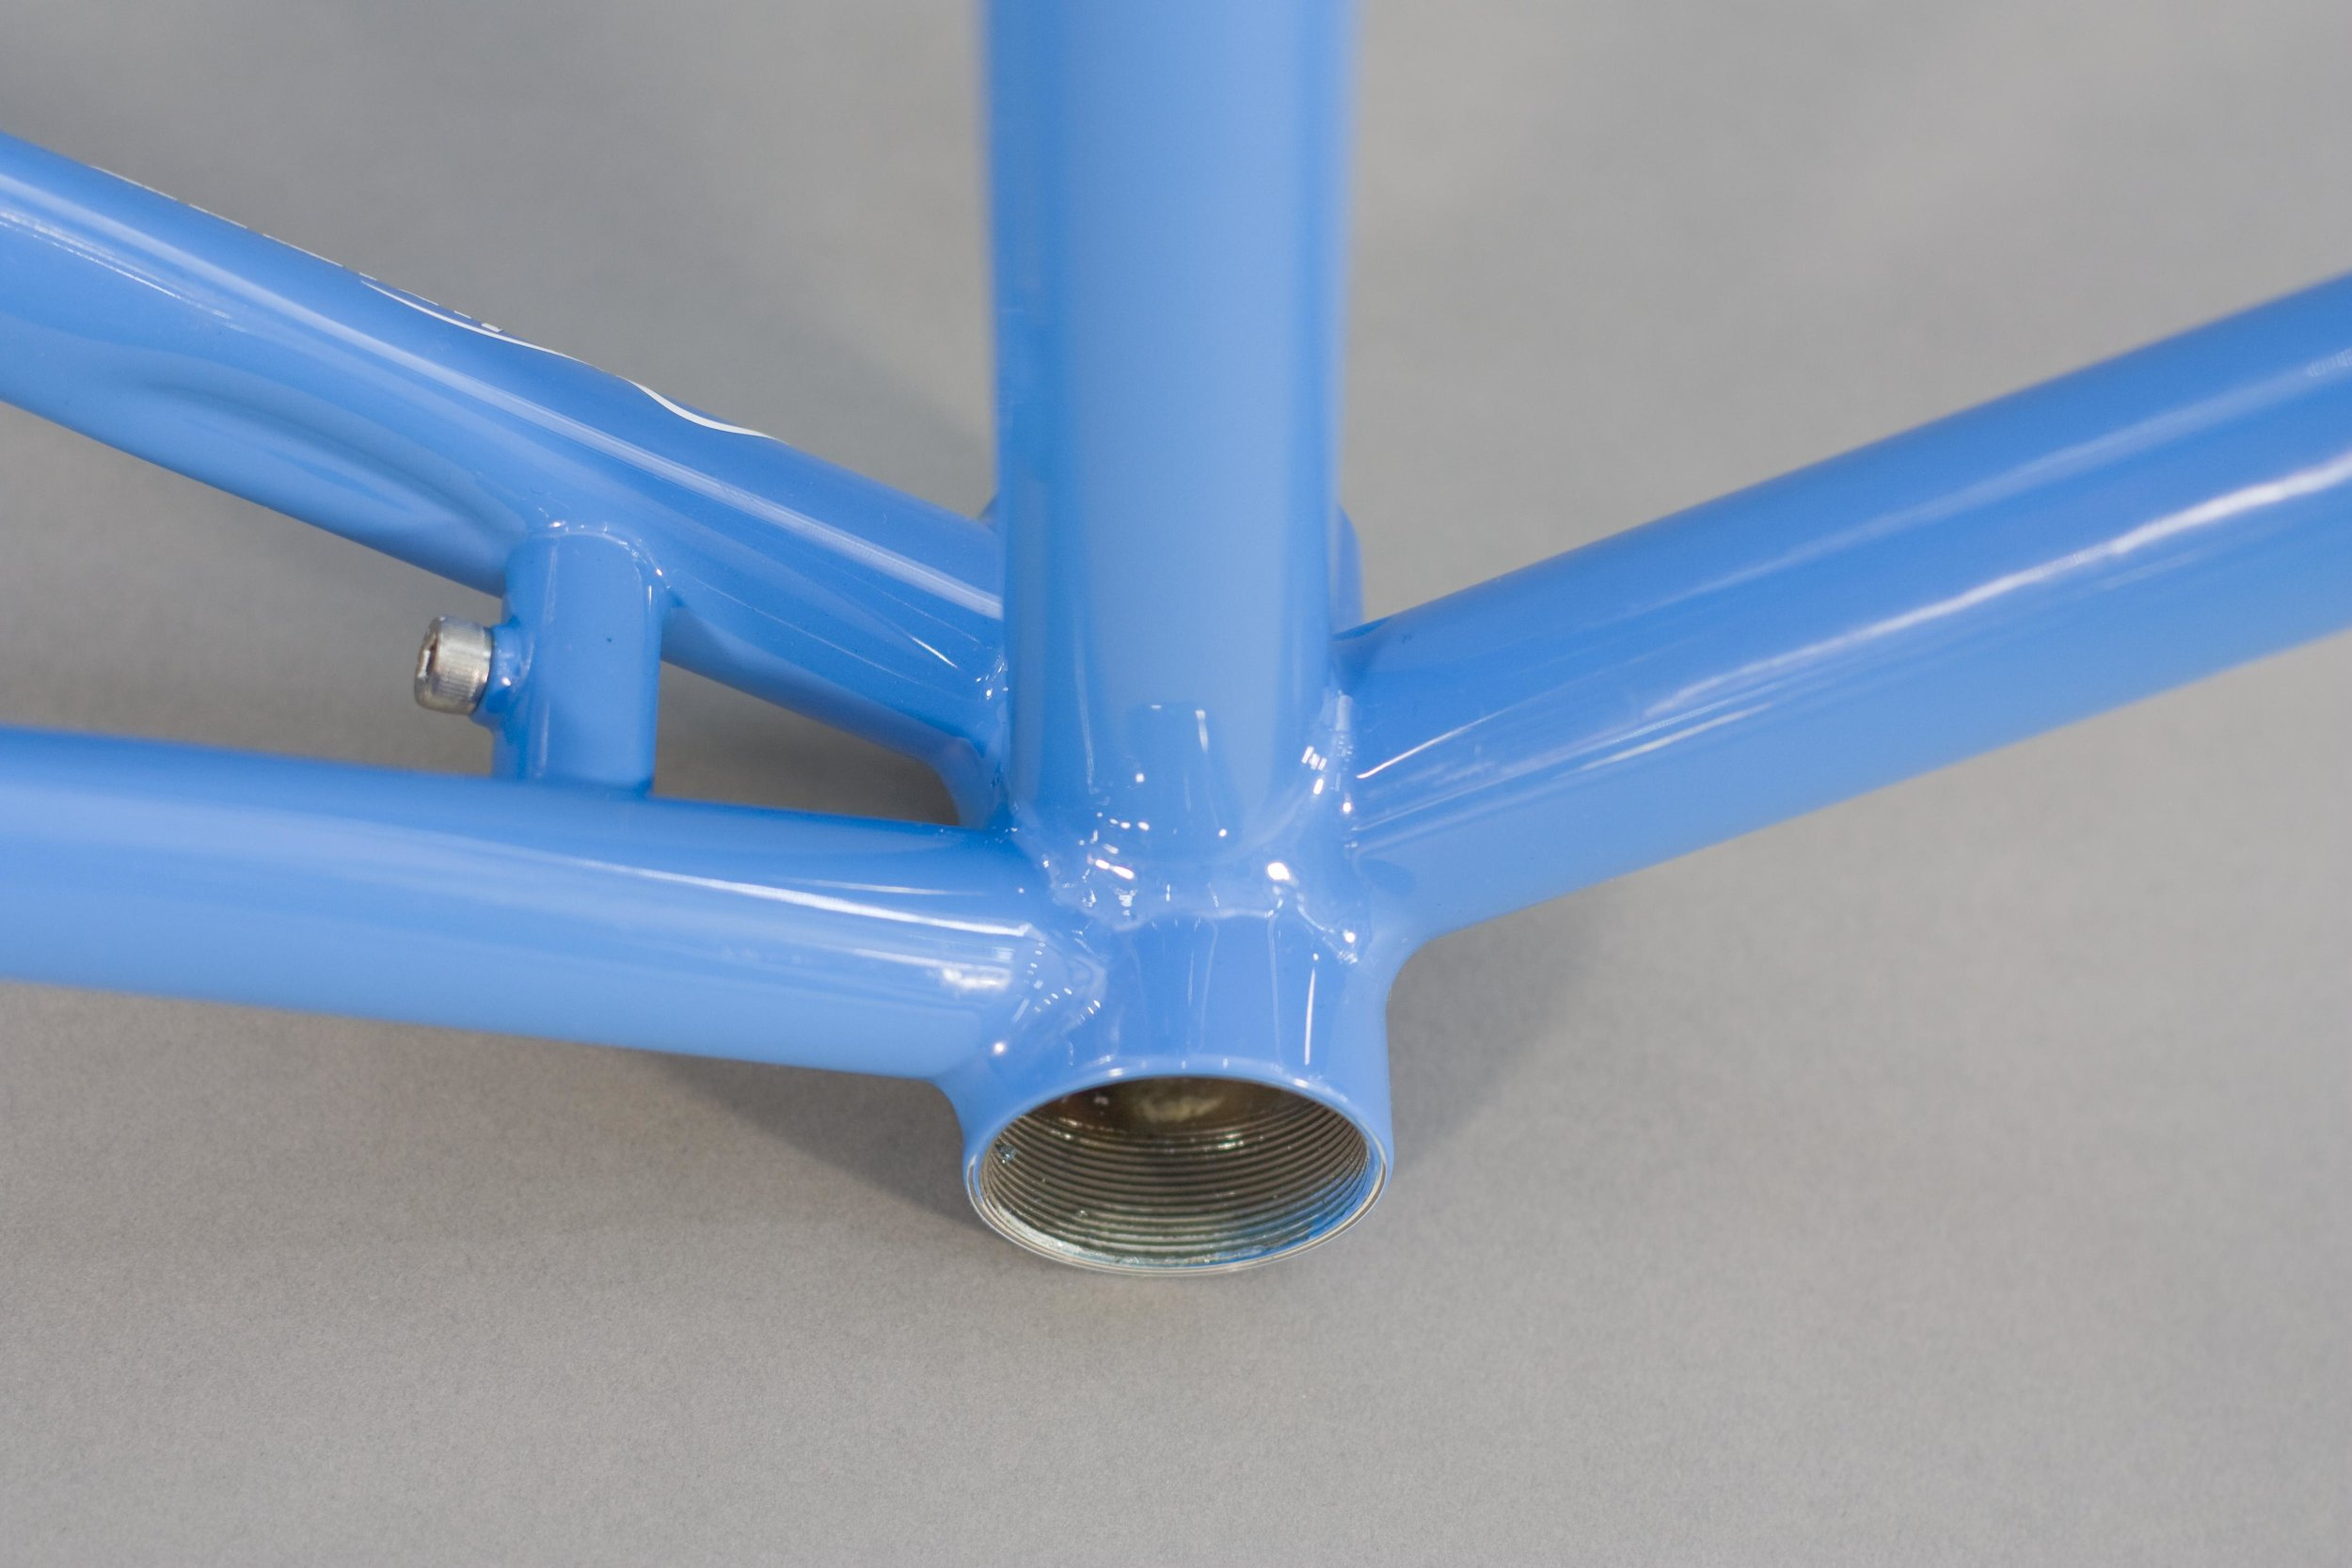 56cm-winter-bicycles-built-pelican_8269876285_o.jpg